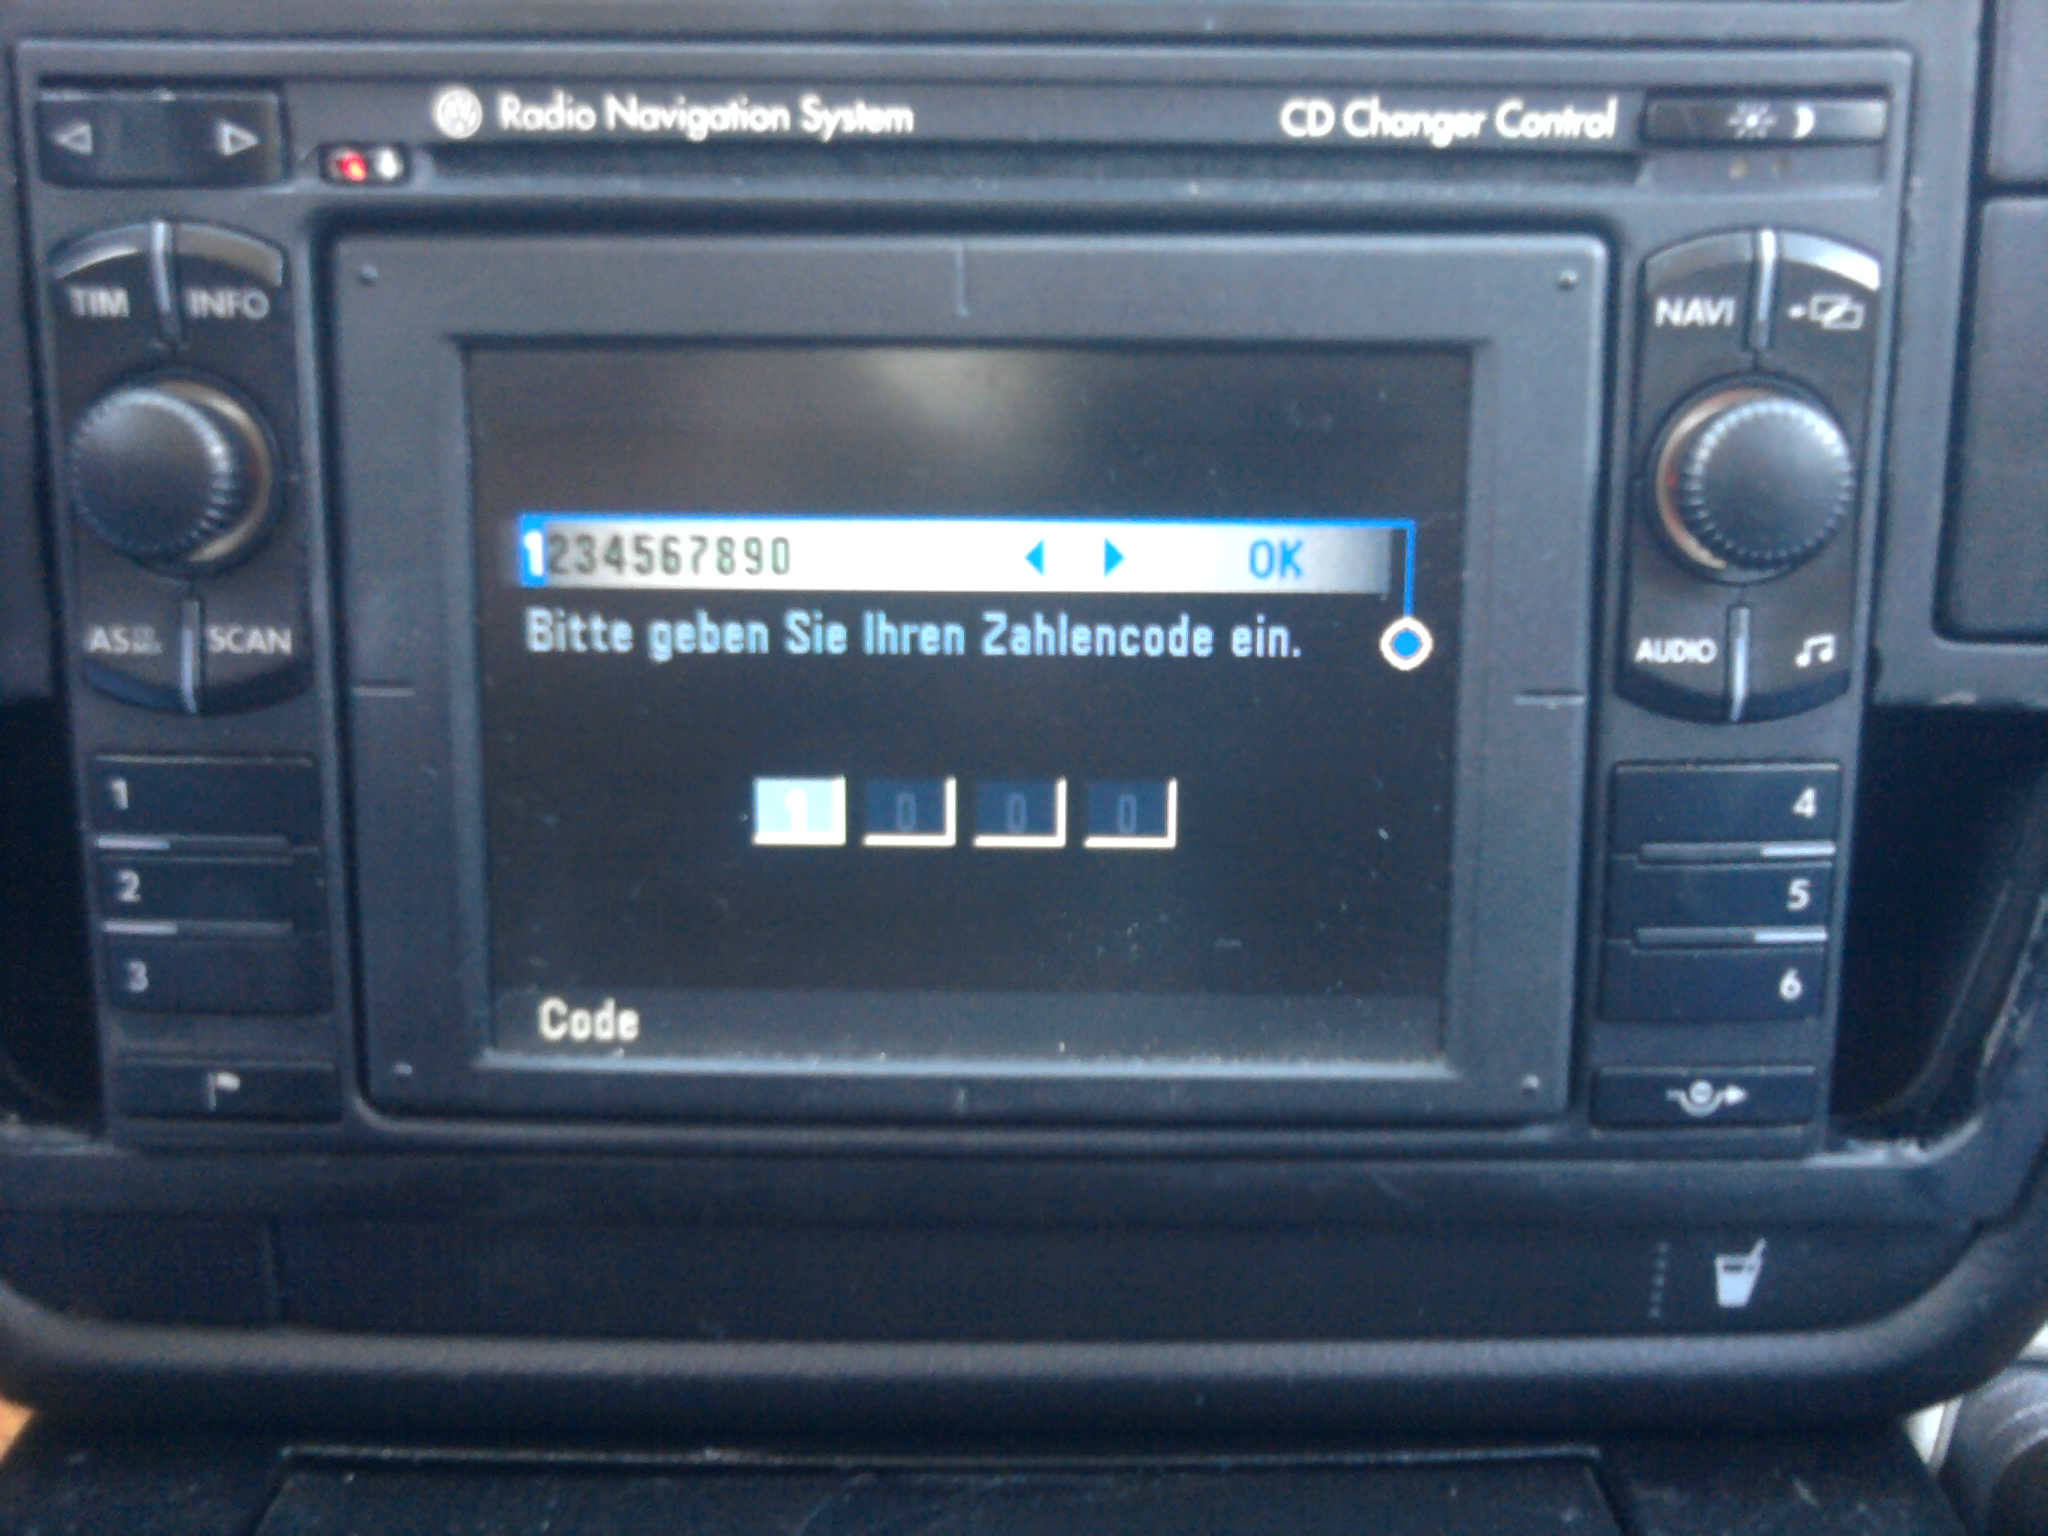 VW Passat B5 - Radio Nav. System MFD - Foto enkoder nie reaguje na wpisanie kodu